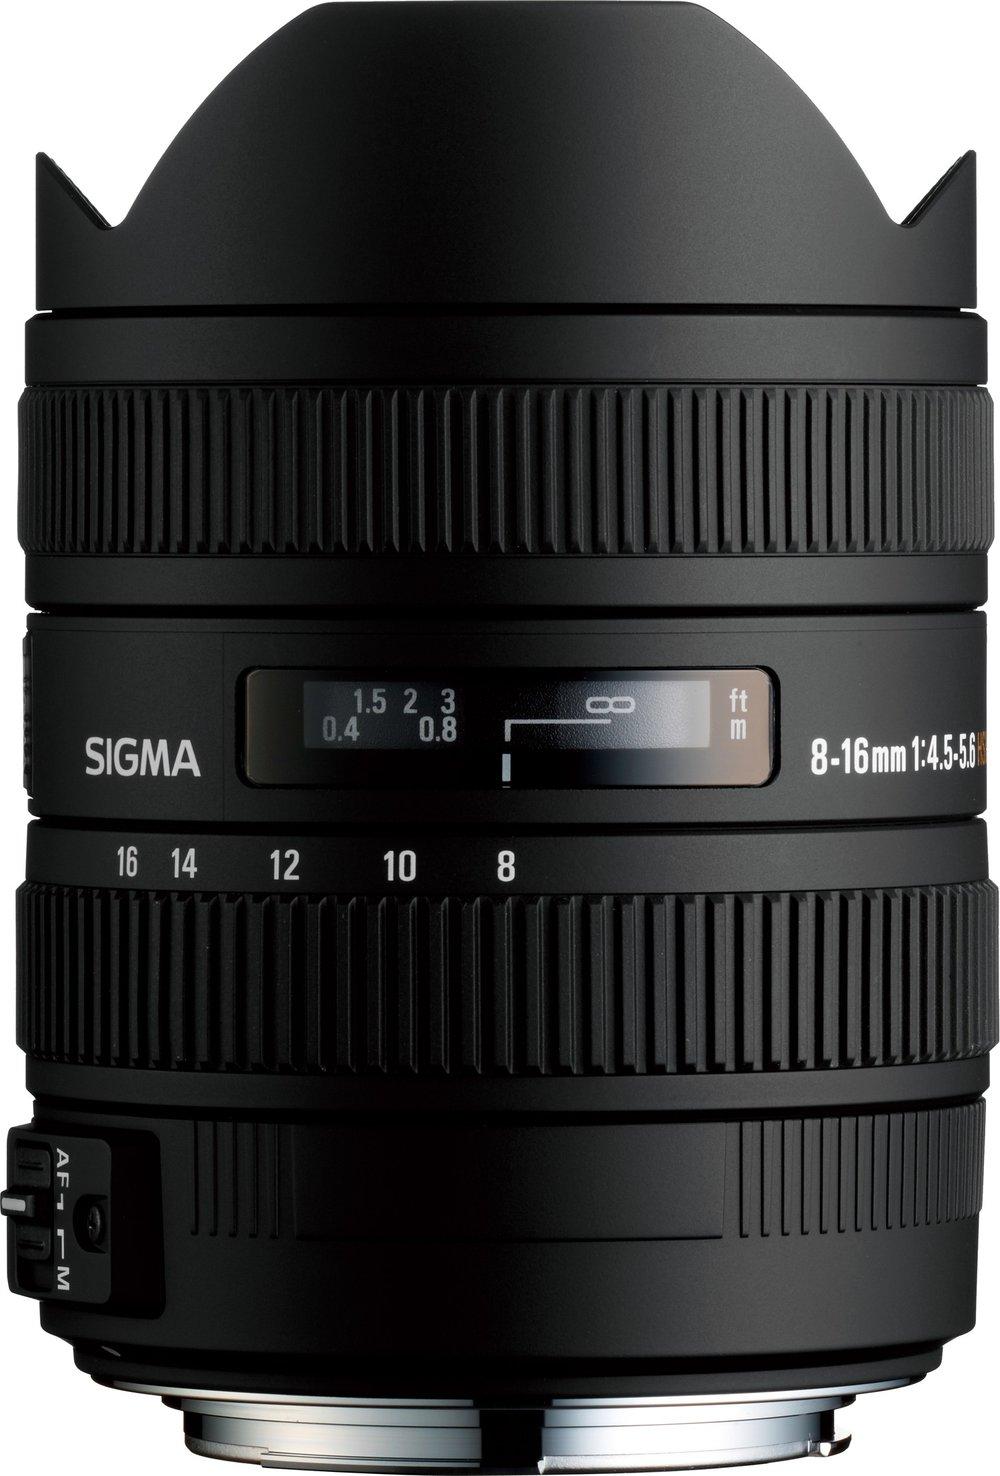 8-16mm-f4-5-5-6-dc-hsm-203-8e7.jpg